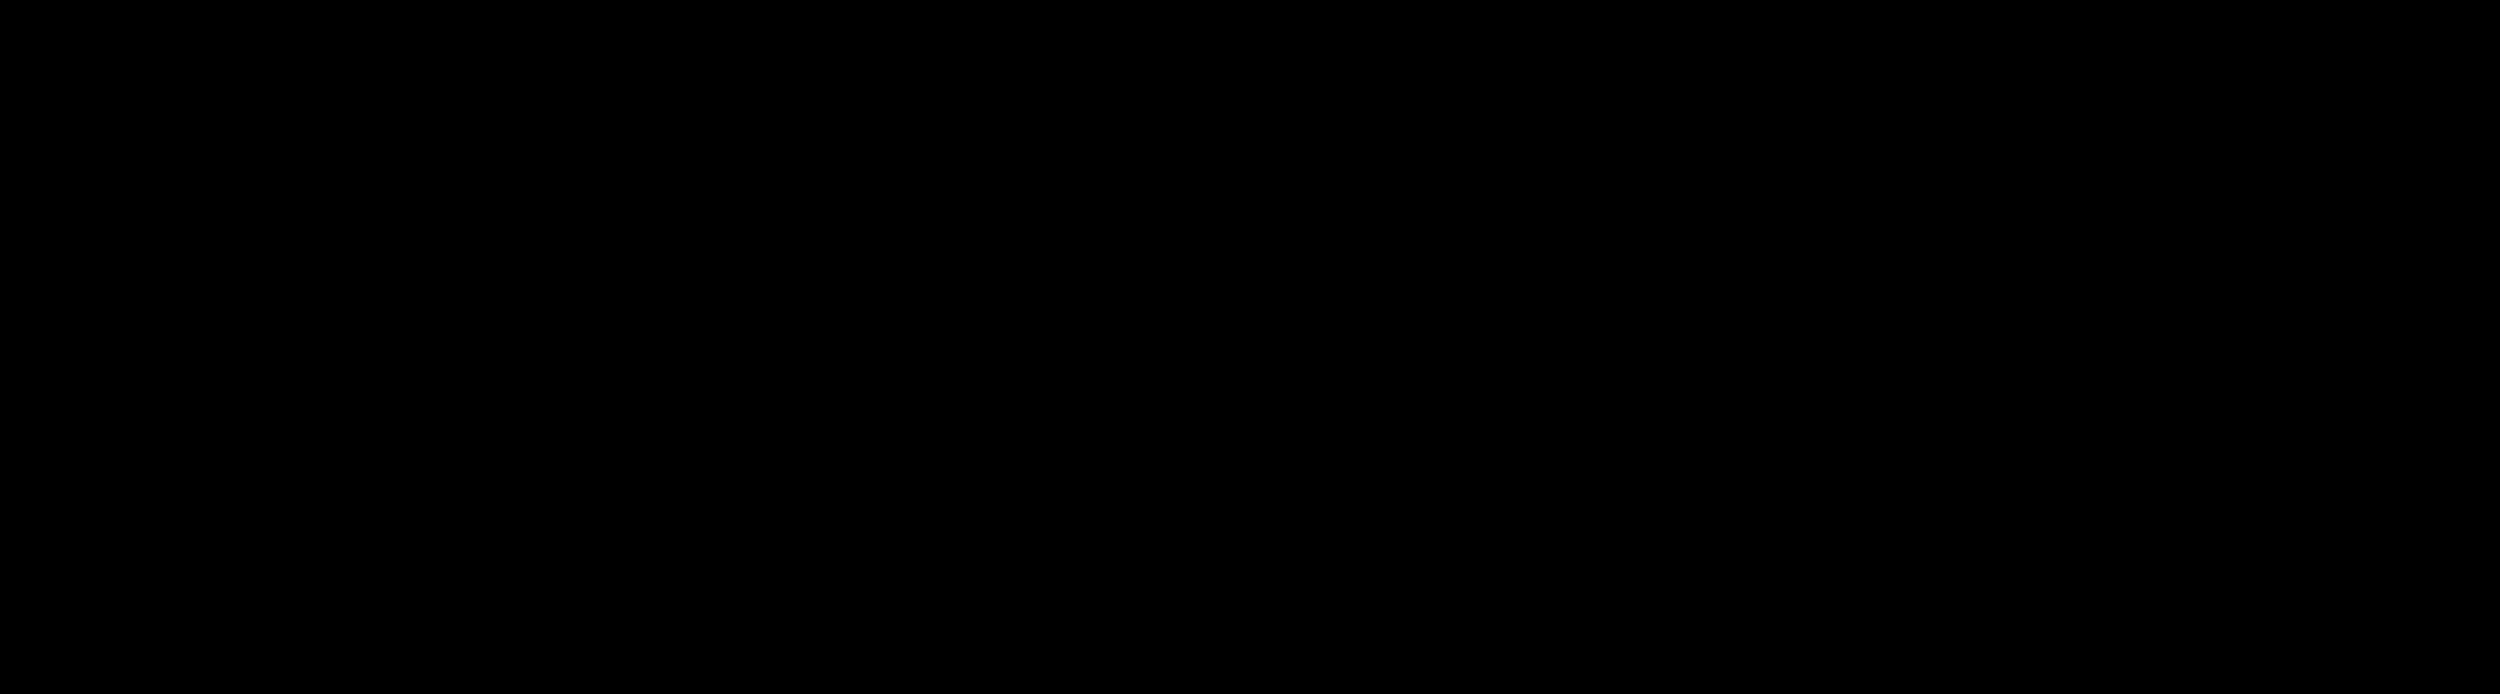 F+O_wyclef jean LR.png